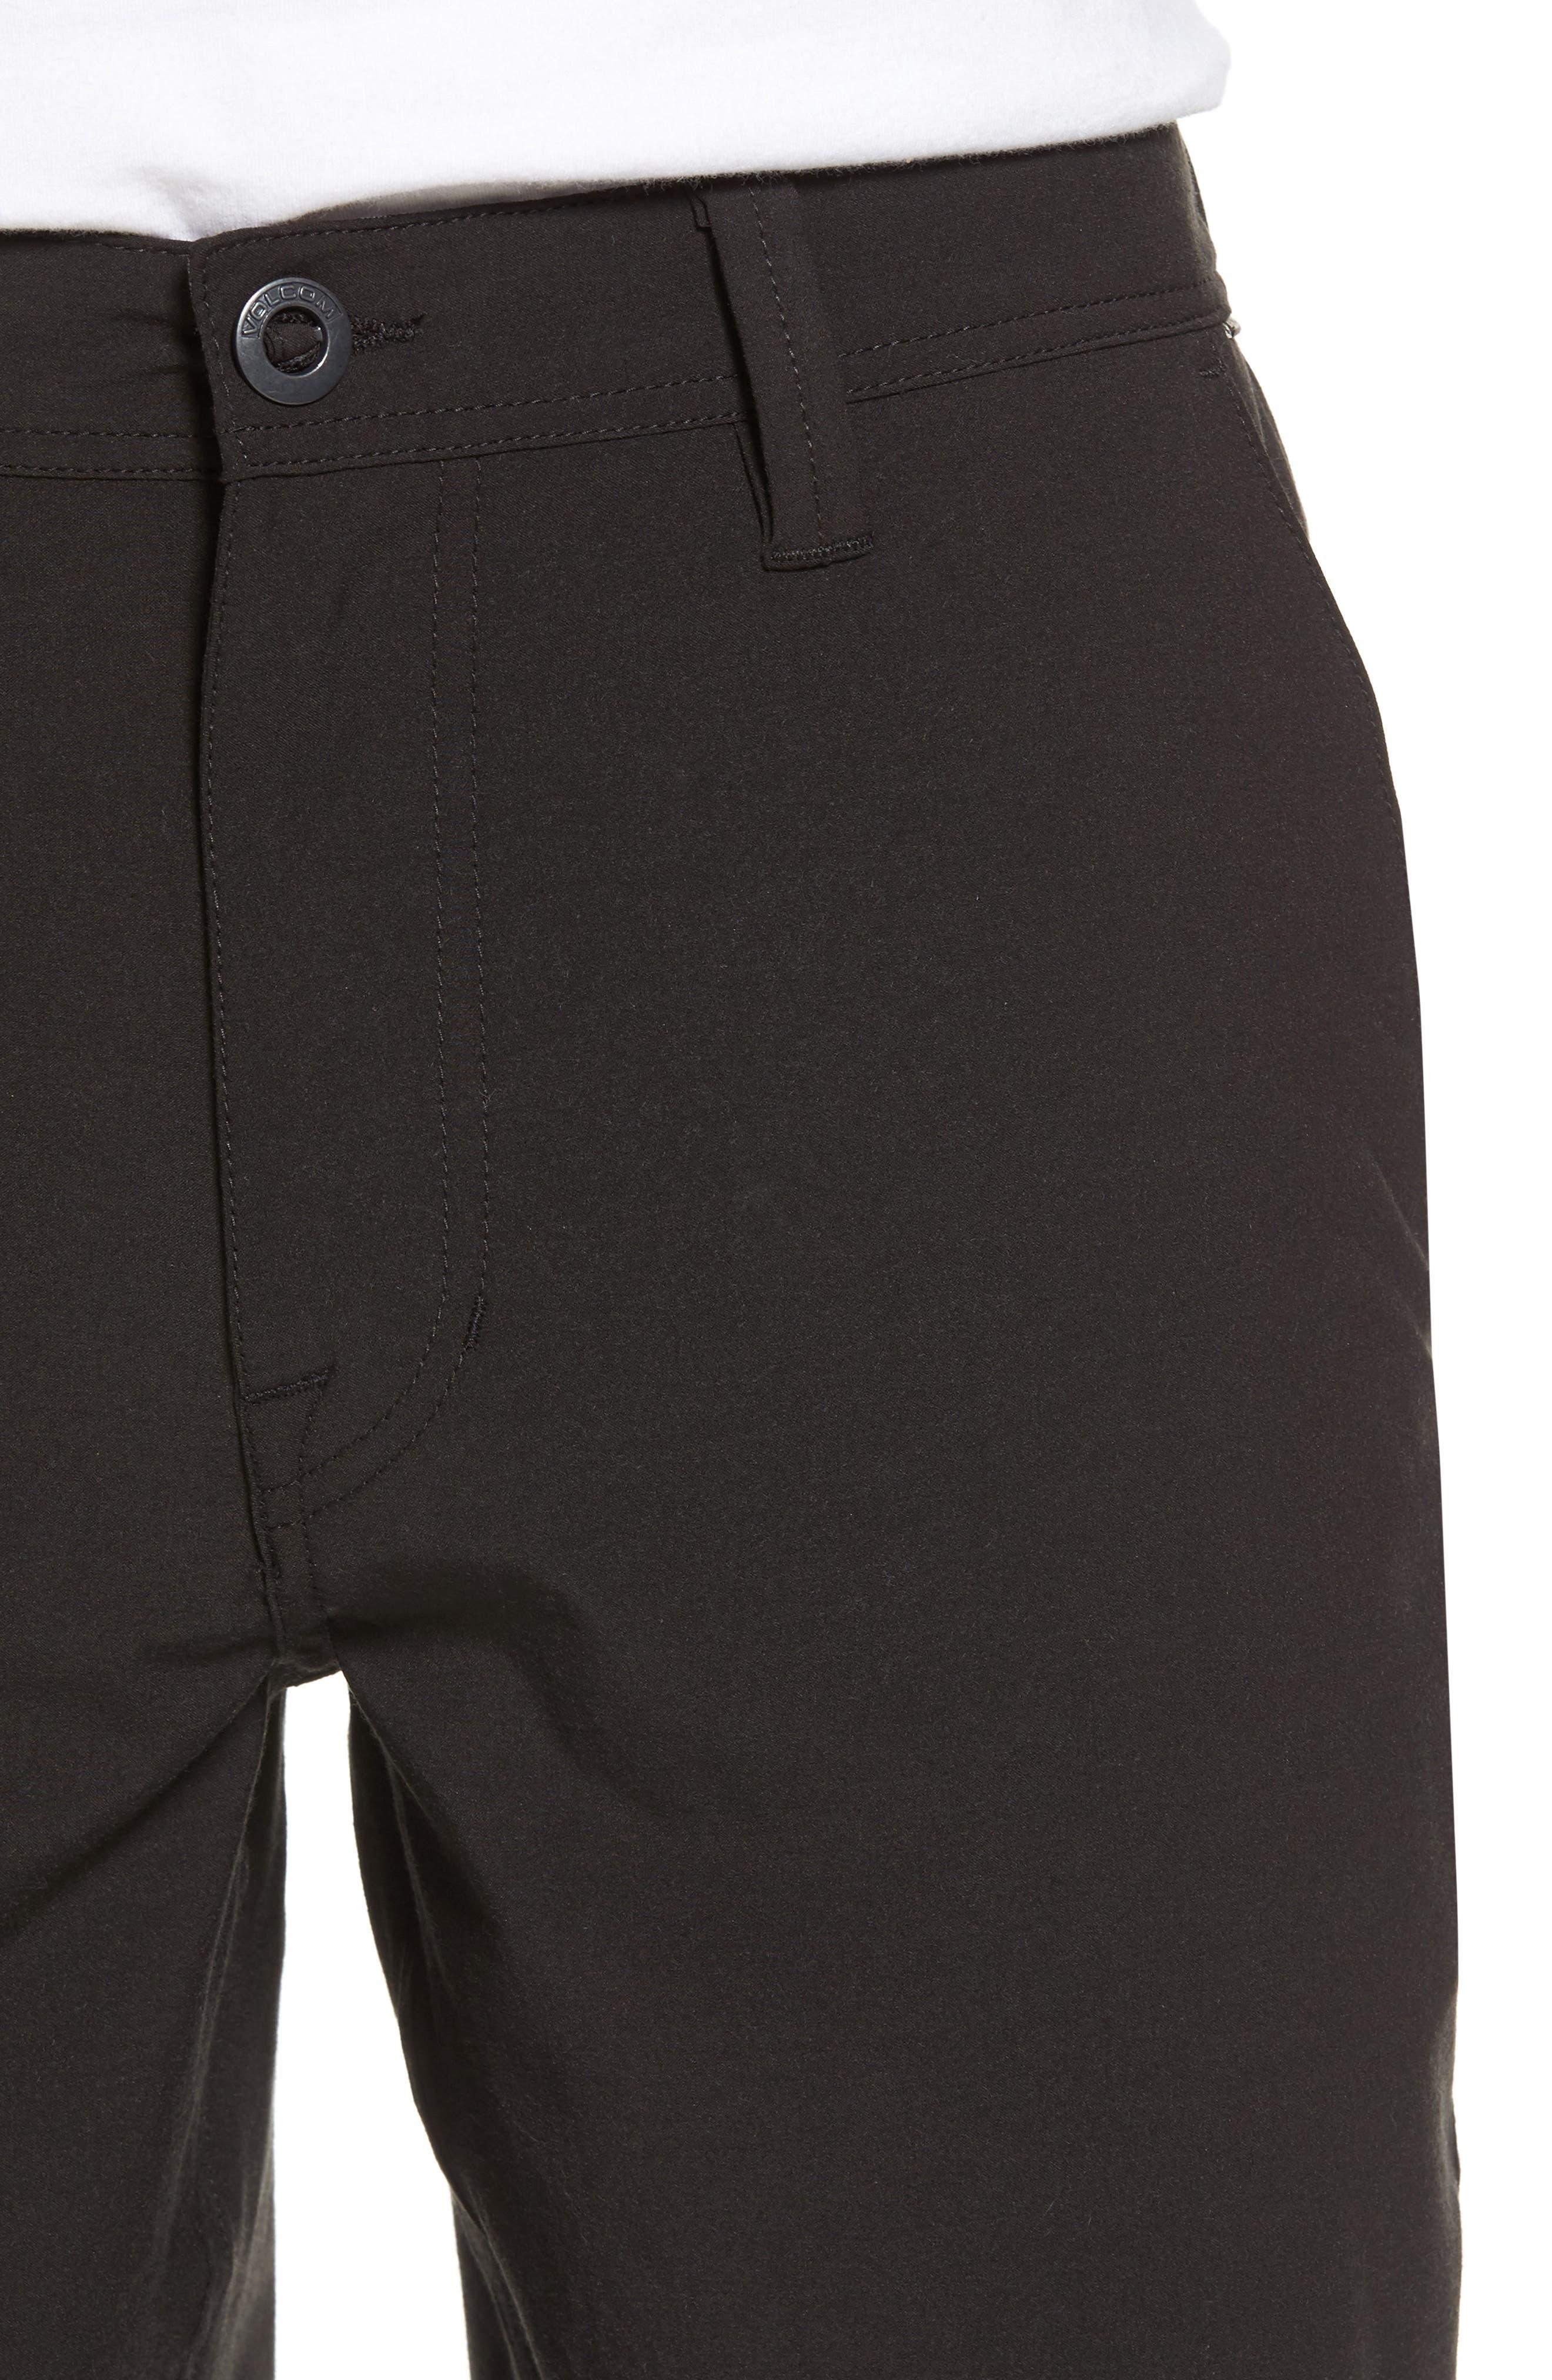 Hybrid Shorts,                             Alternate thumbnail 4, color,                             BLACK